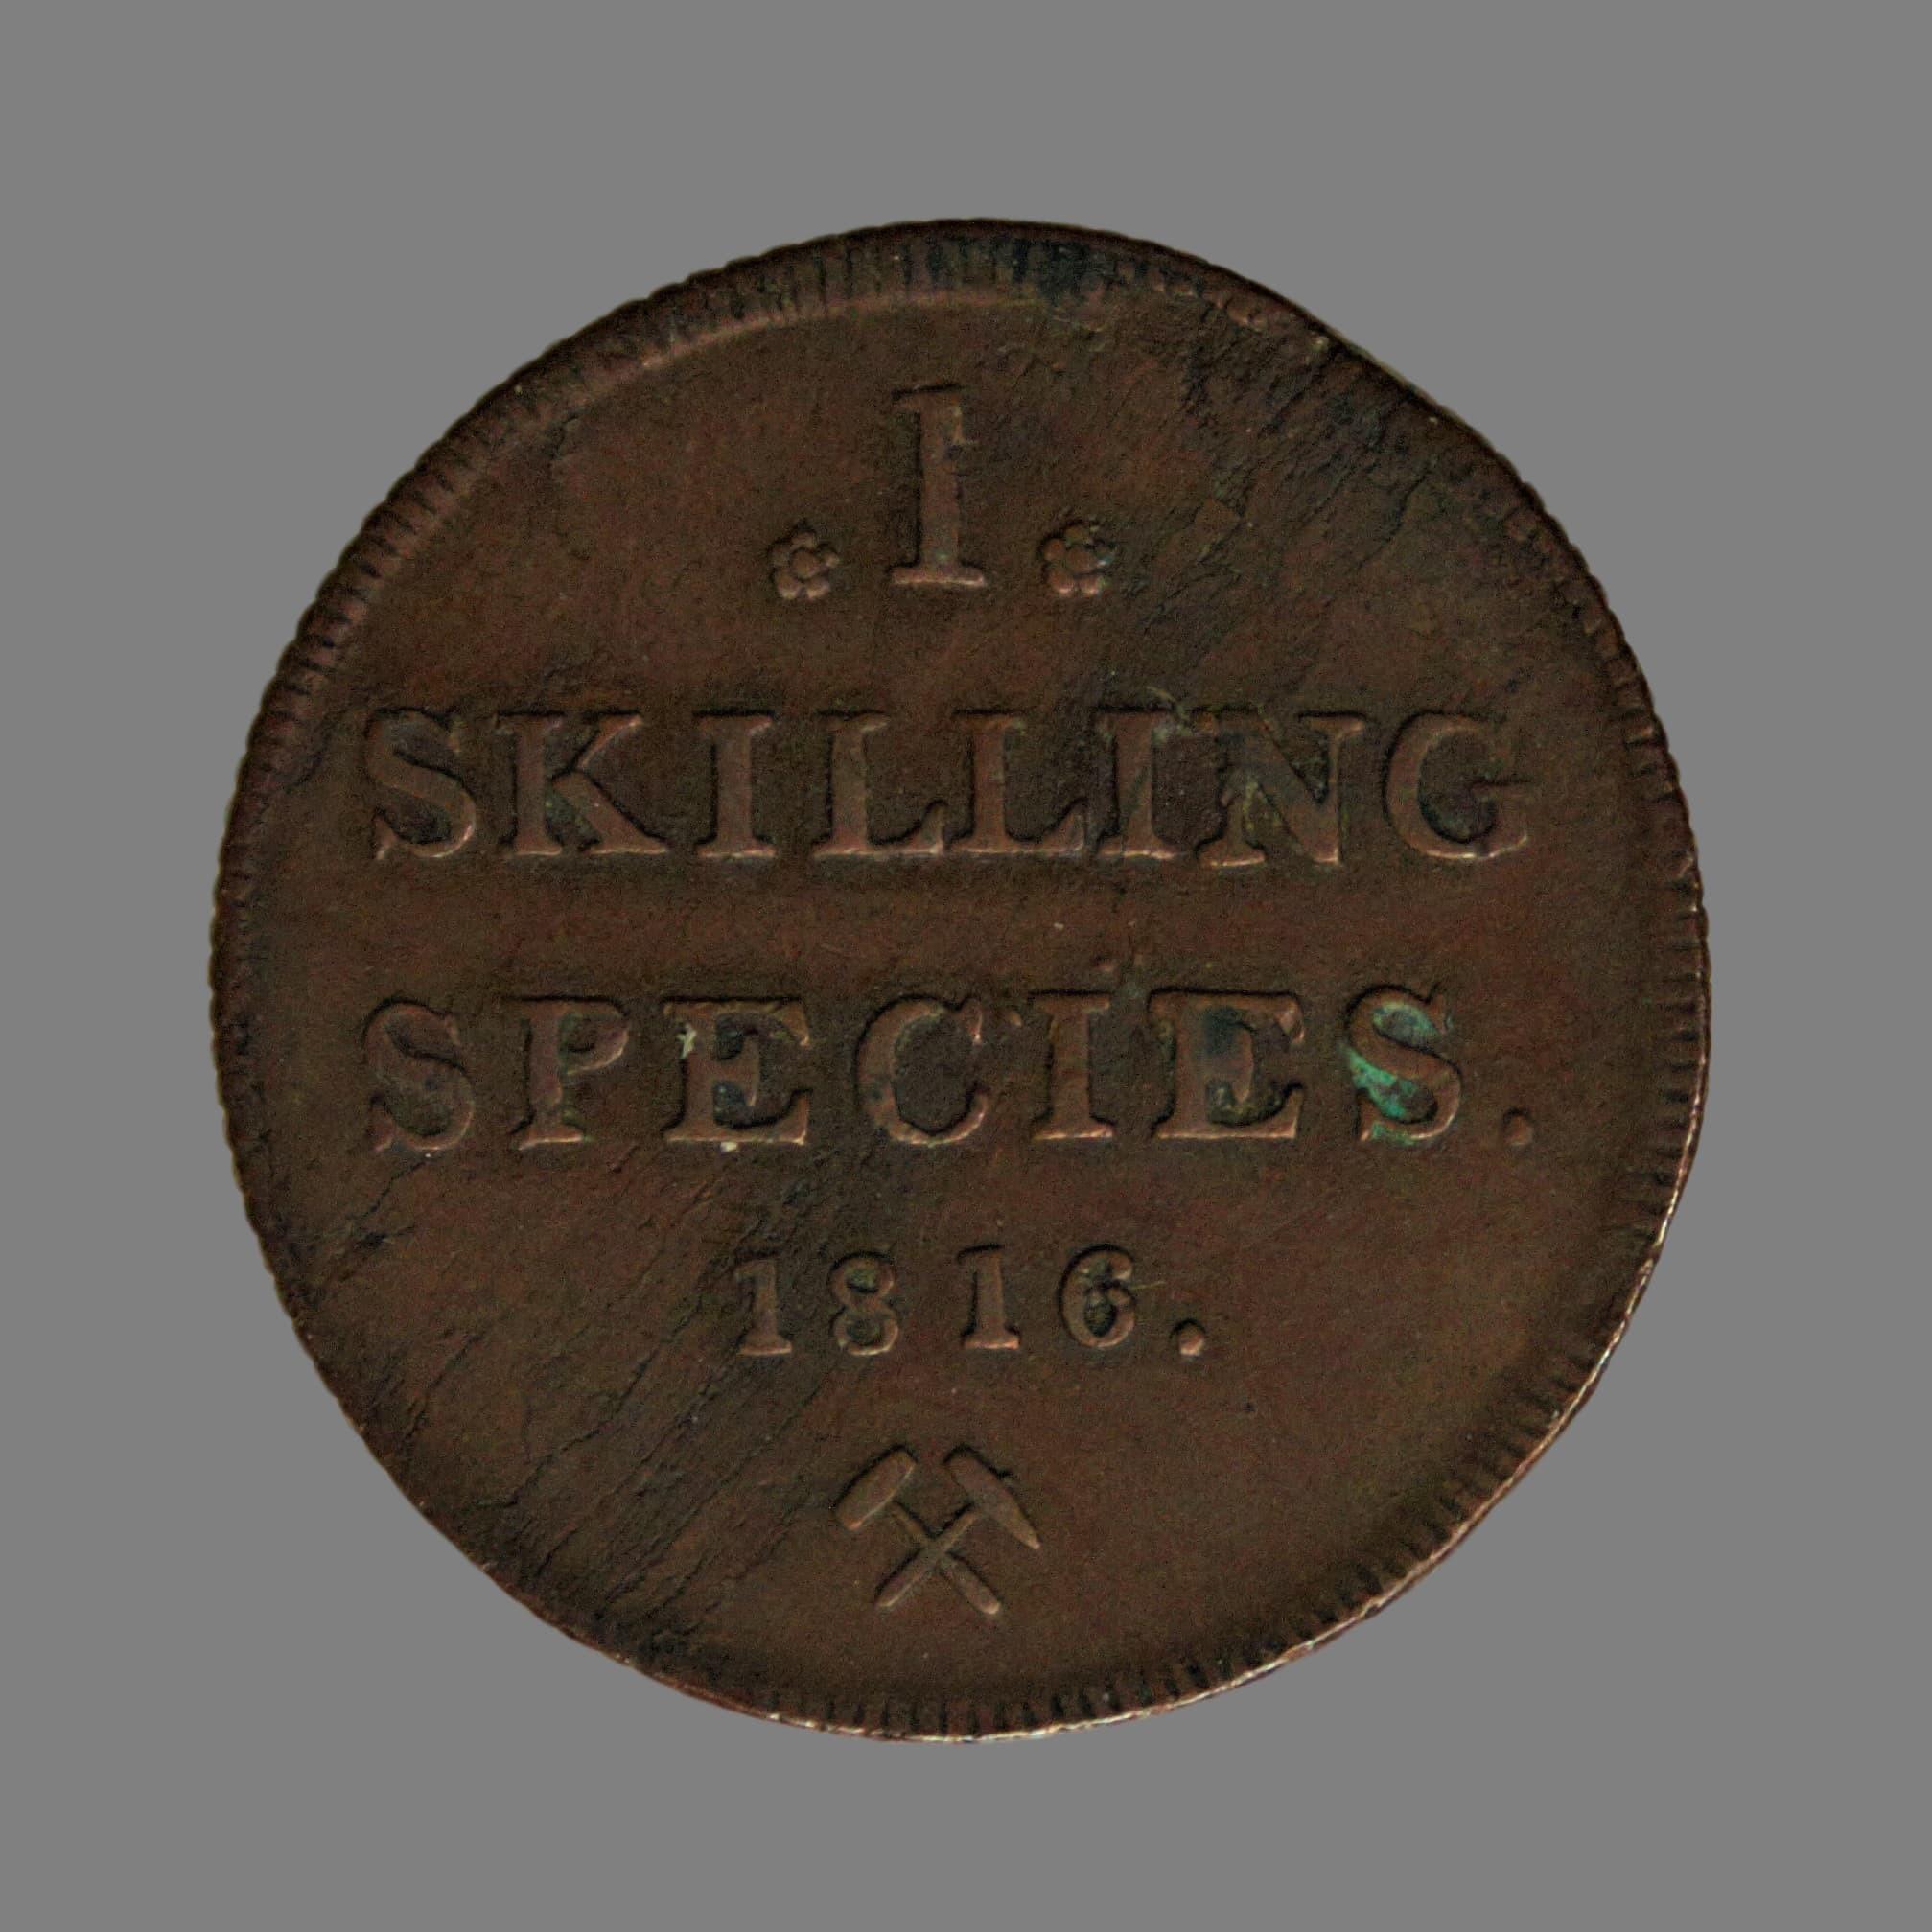 1 skilling 1816